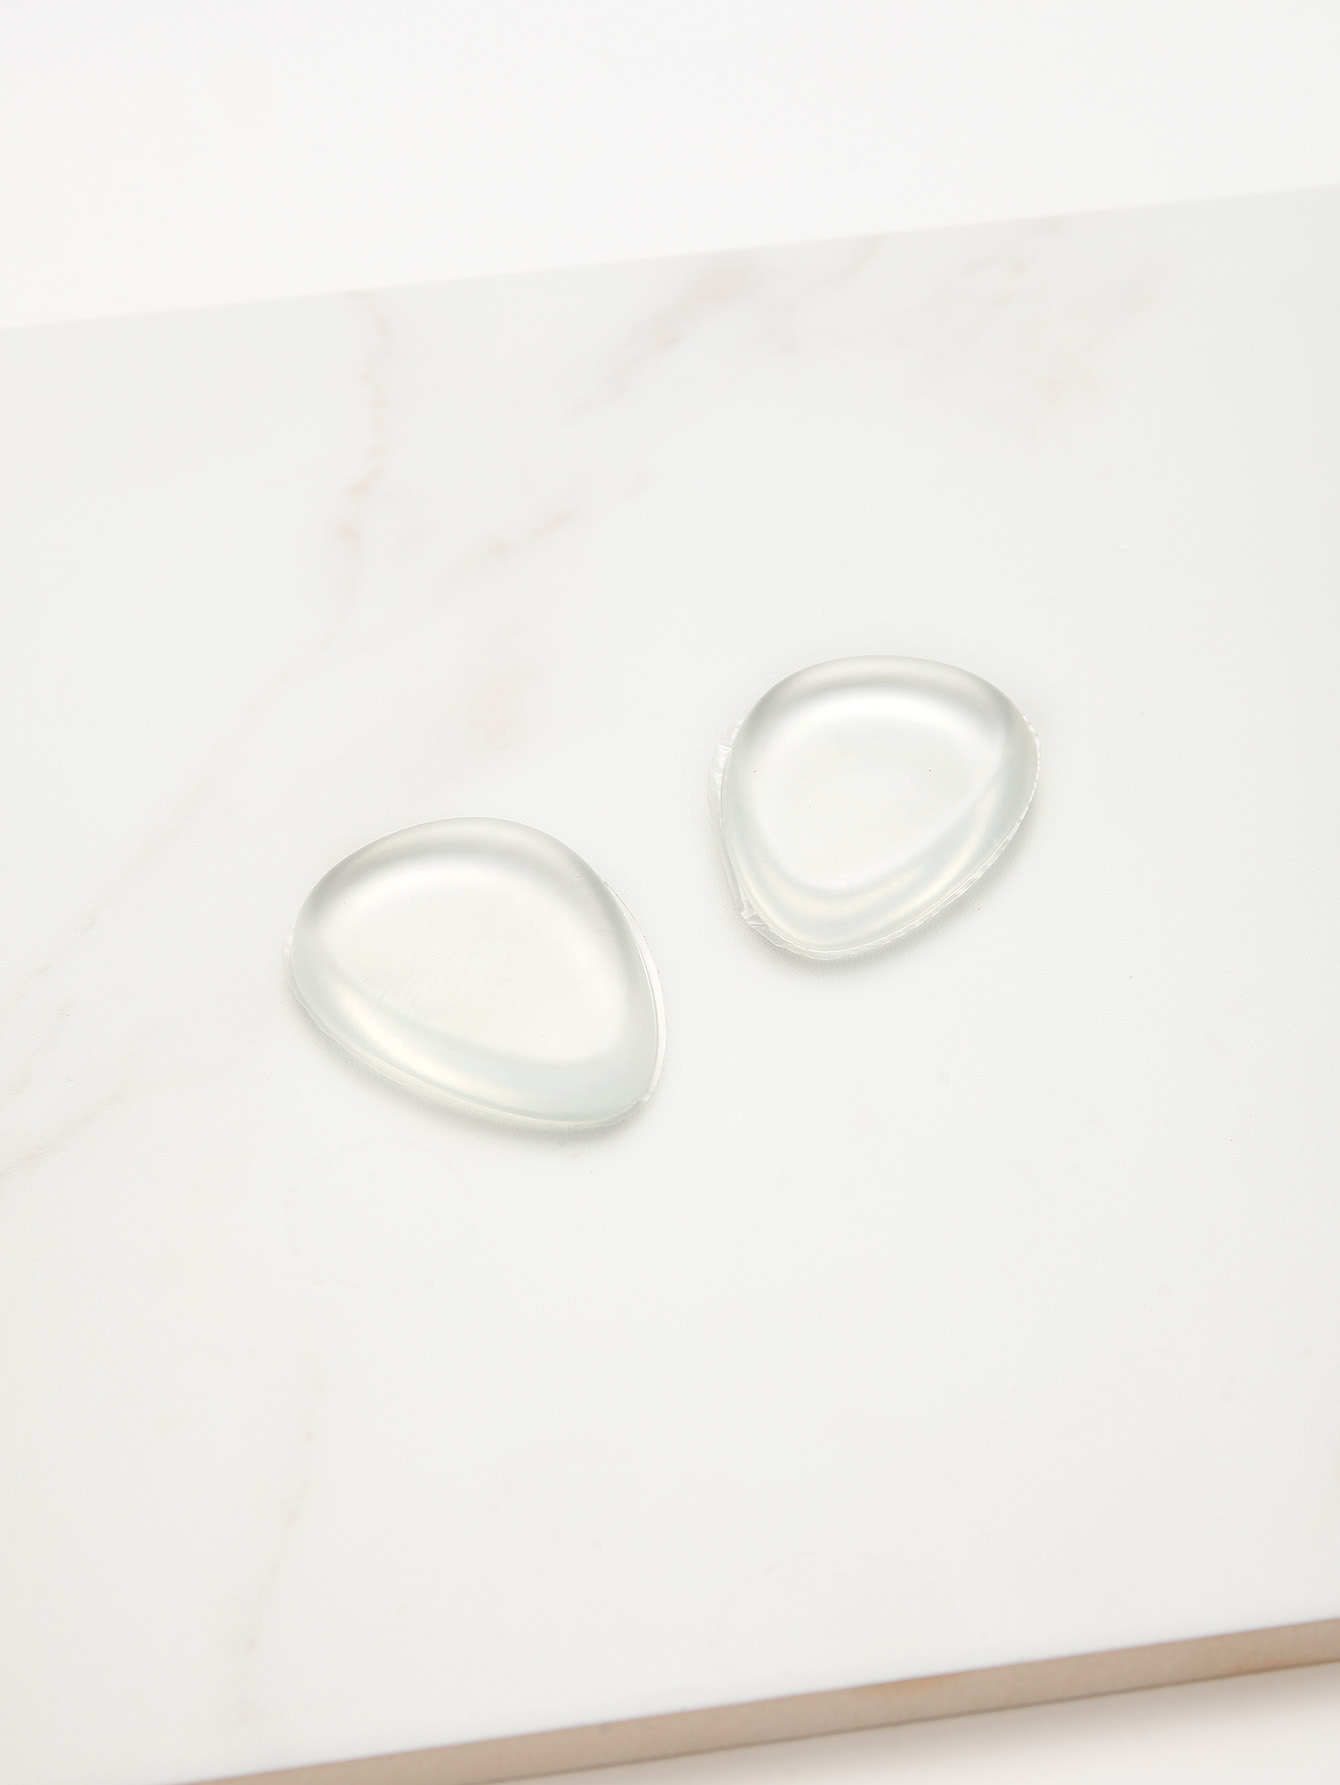 Silicone Gel Transparent Makeup Puff 2pcs 2pcs waterdrop sponge puff and 2pcs holder